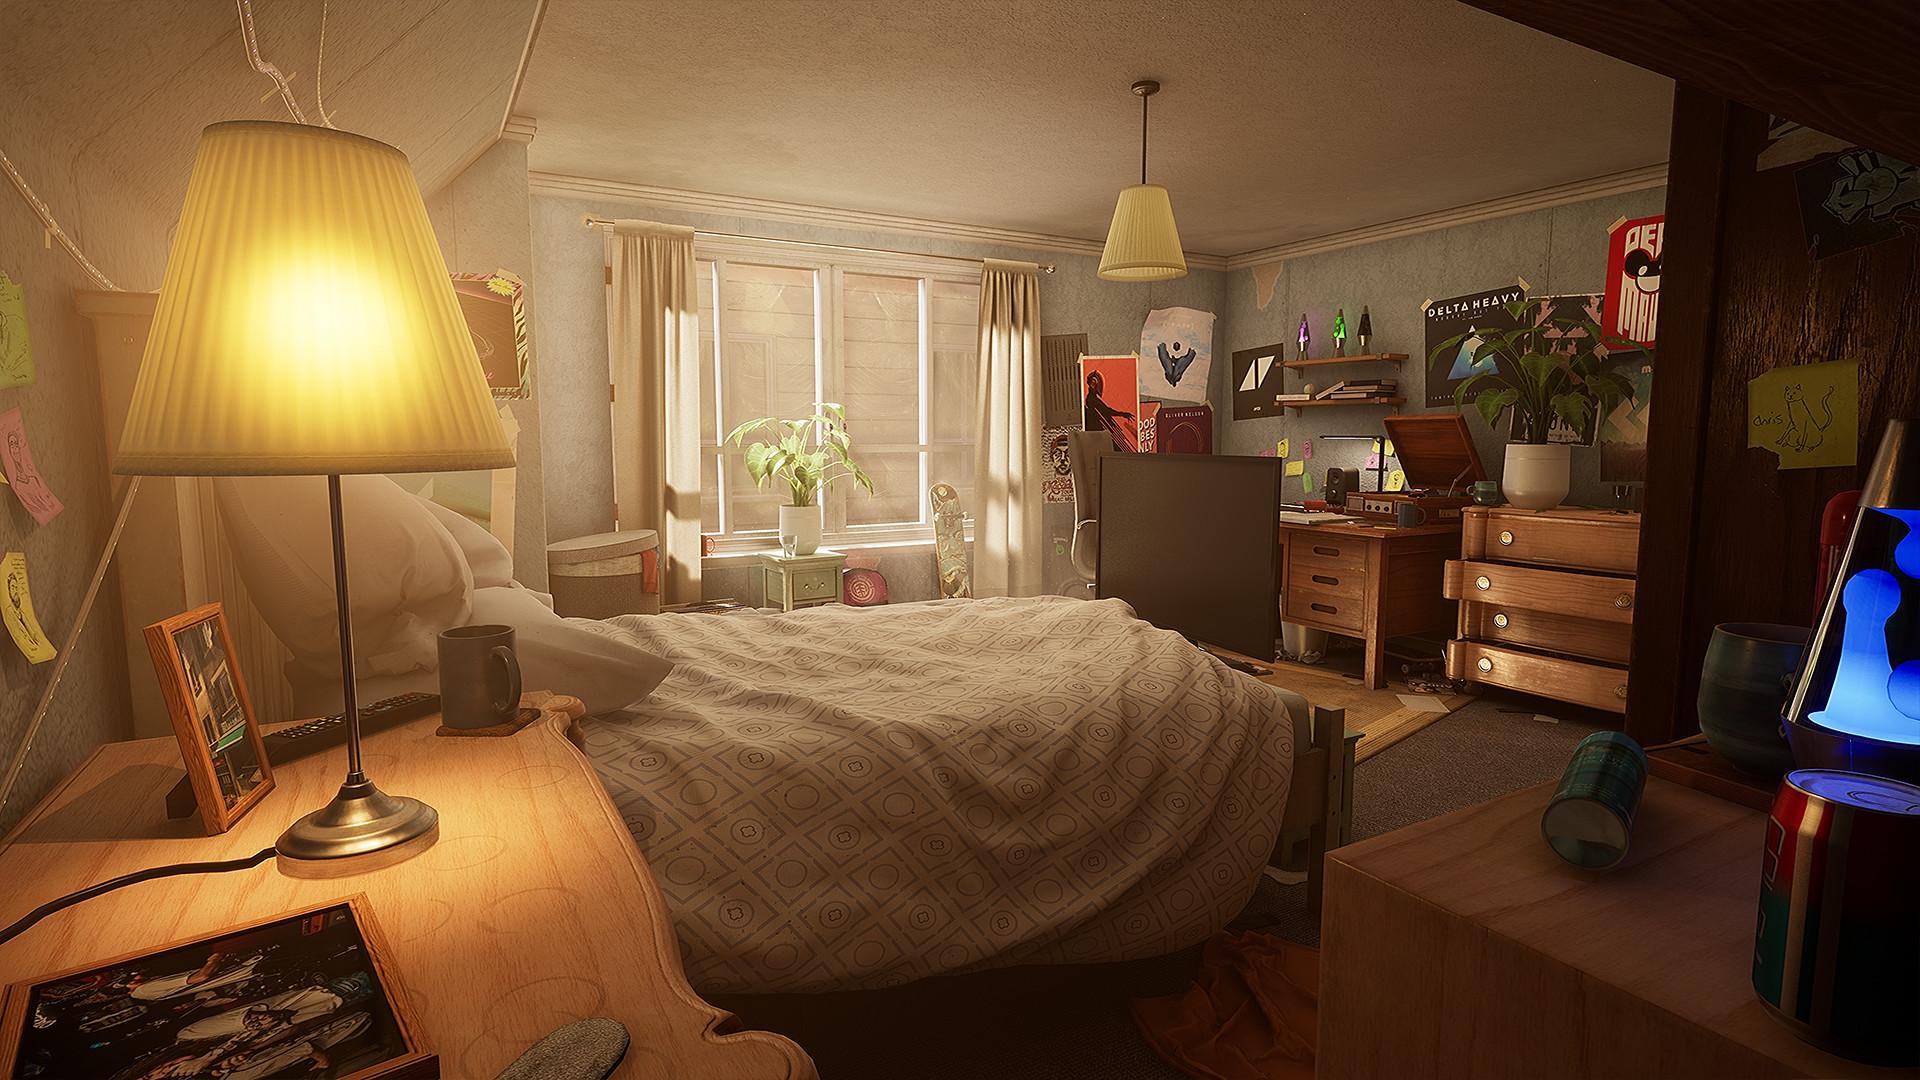 Green and Brown Bedroom Luxury Wip] [ue4] Teenagers Bedroom — Polycount